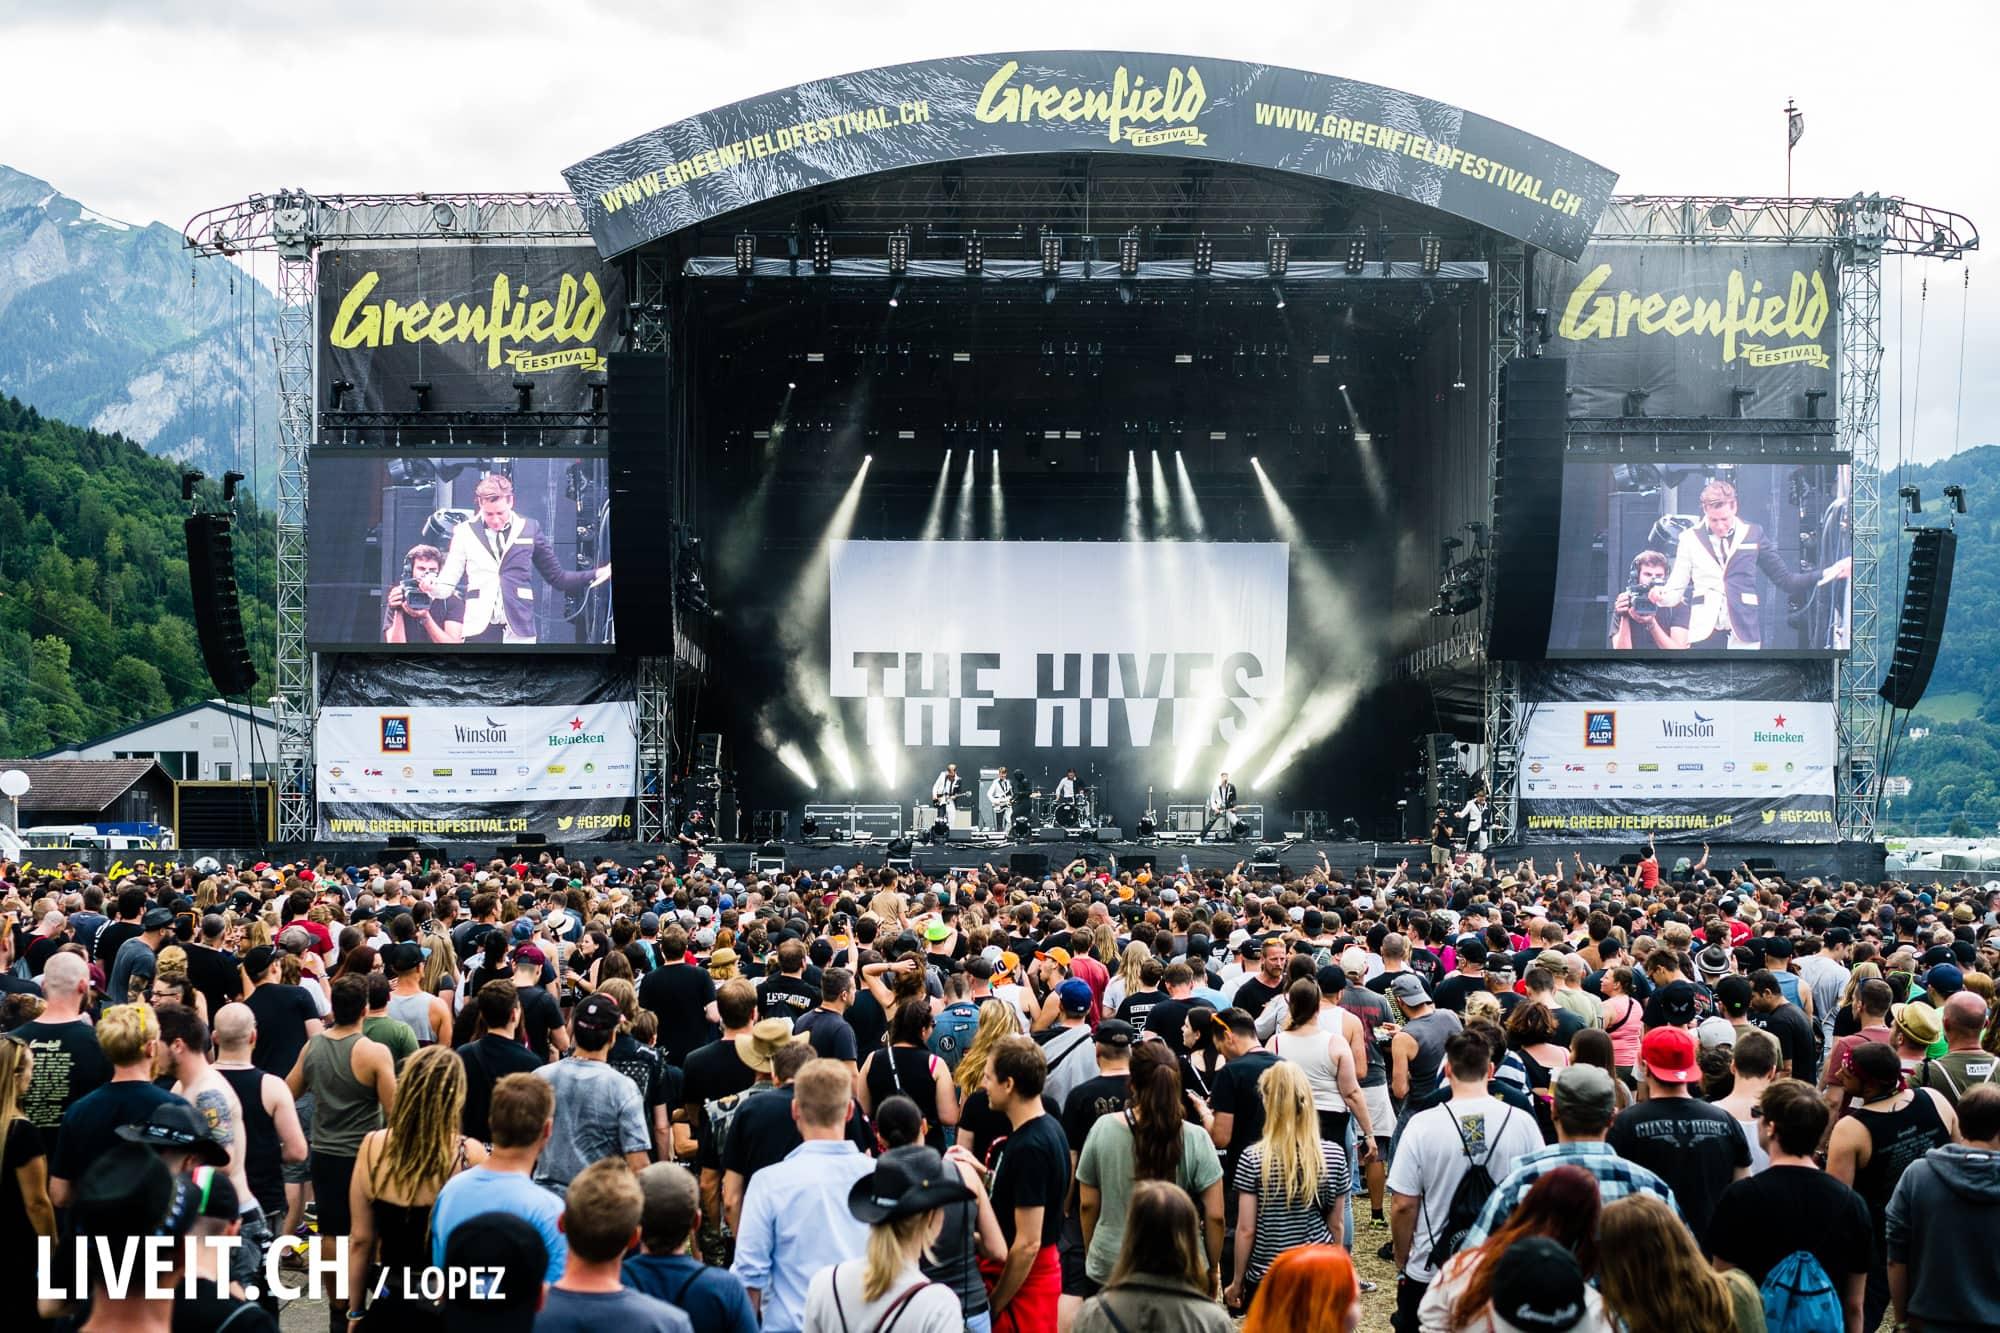 SCHWEIZ GREENFIELD FESTIVAL 2018